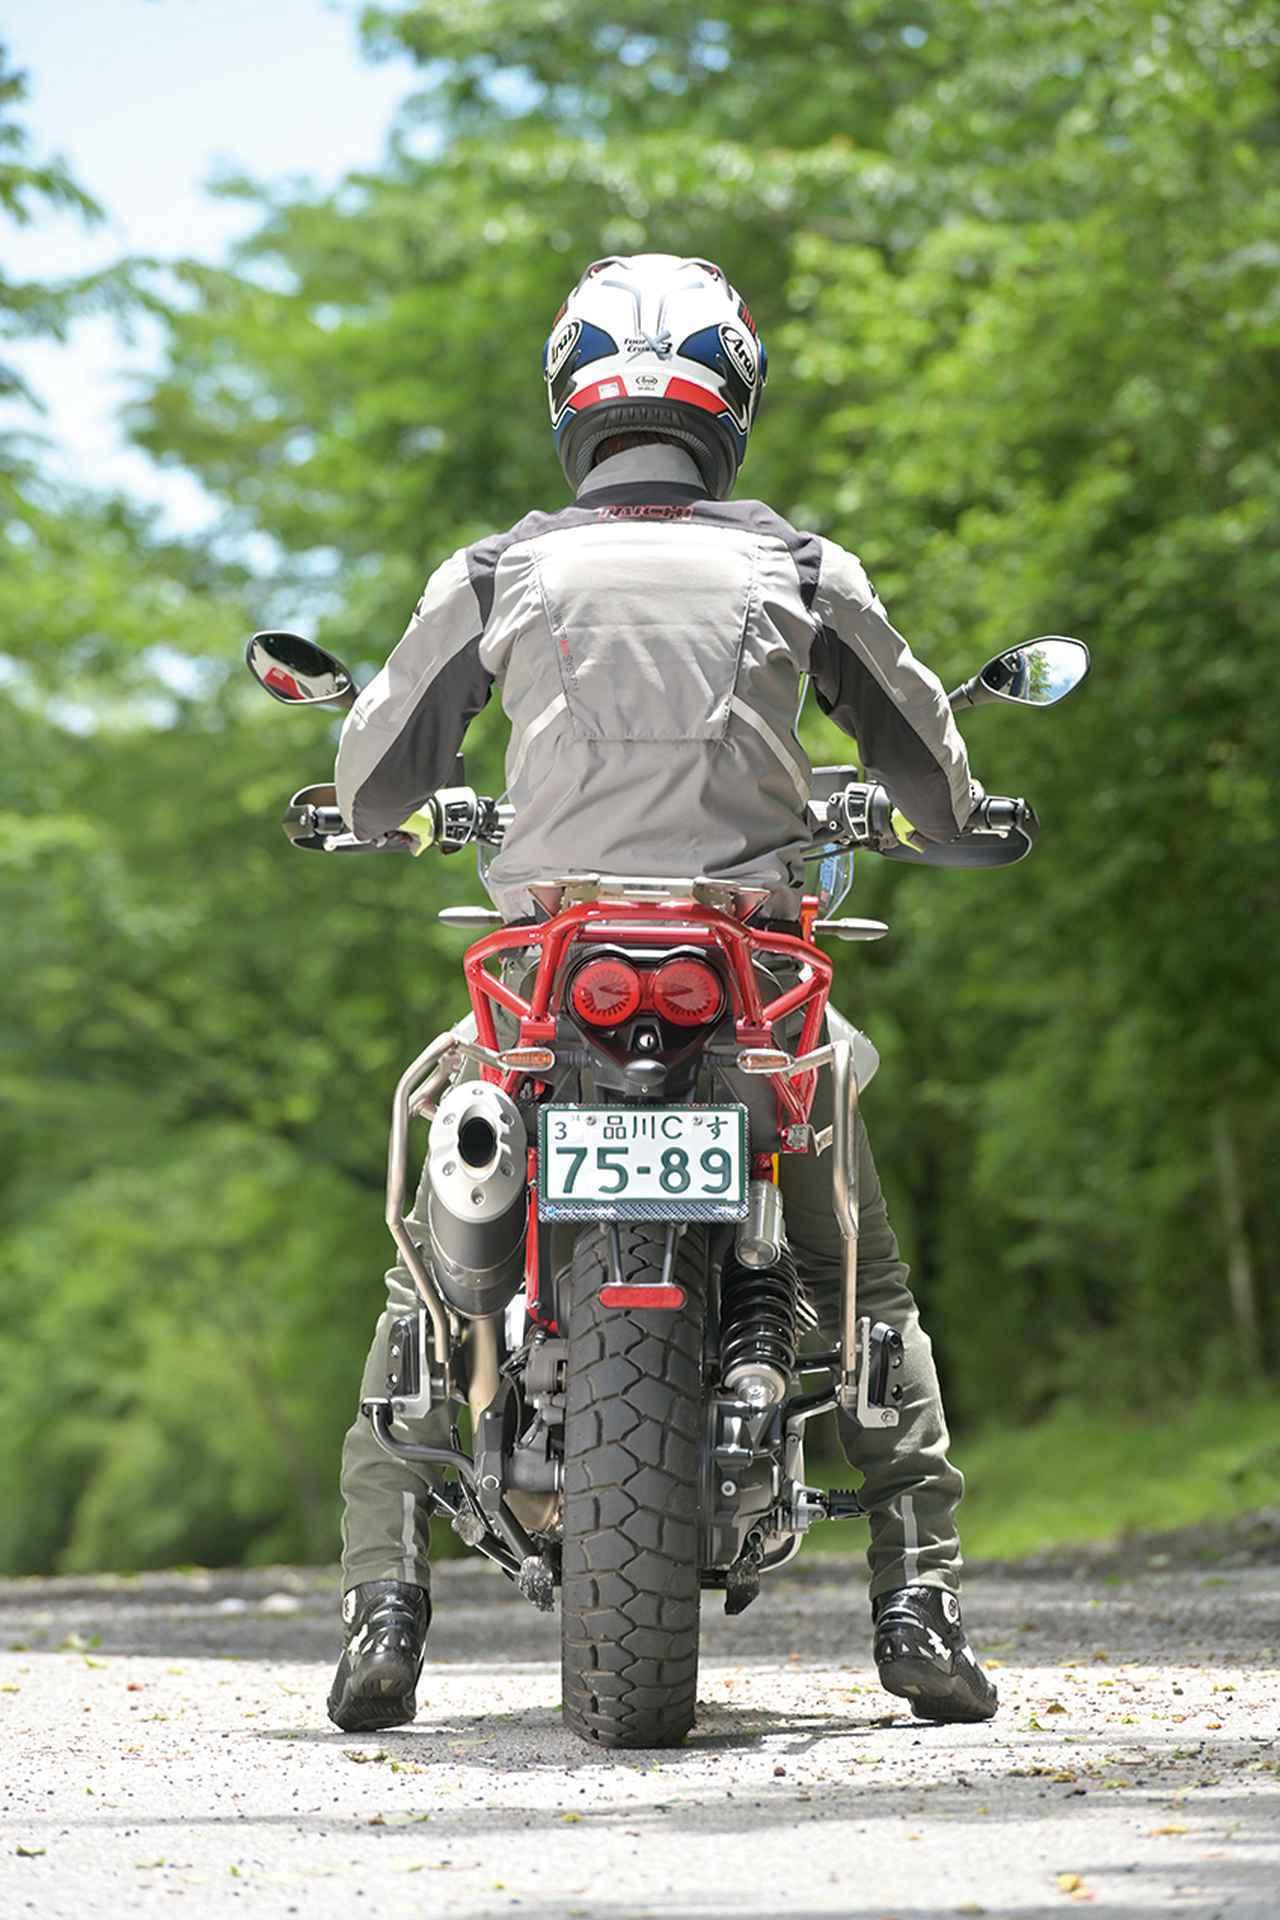 Images : 14番目の画像 - モト・グッツィ「V85TTの写真を全て見る - webオートバイ